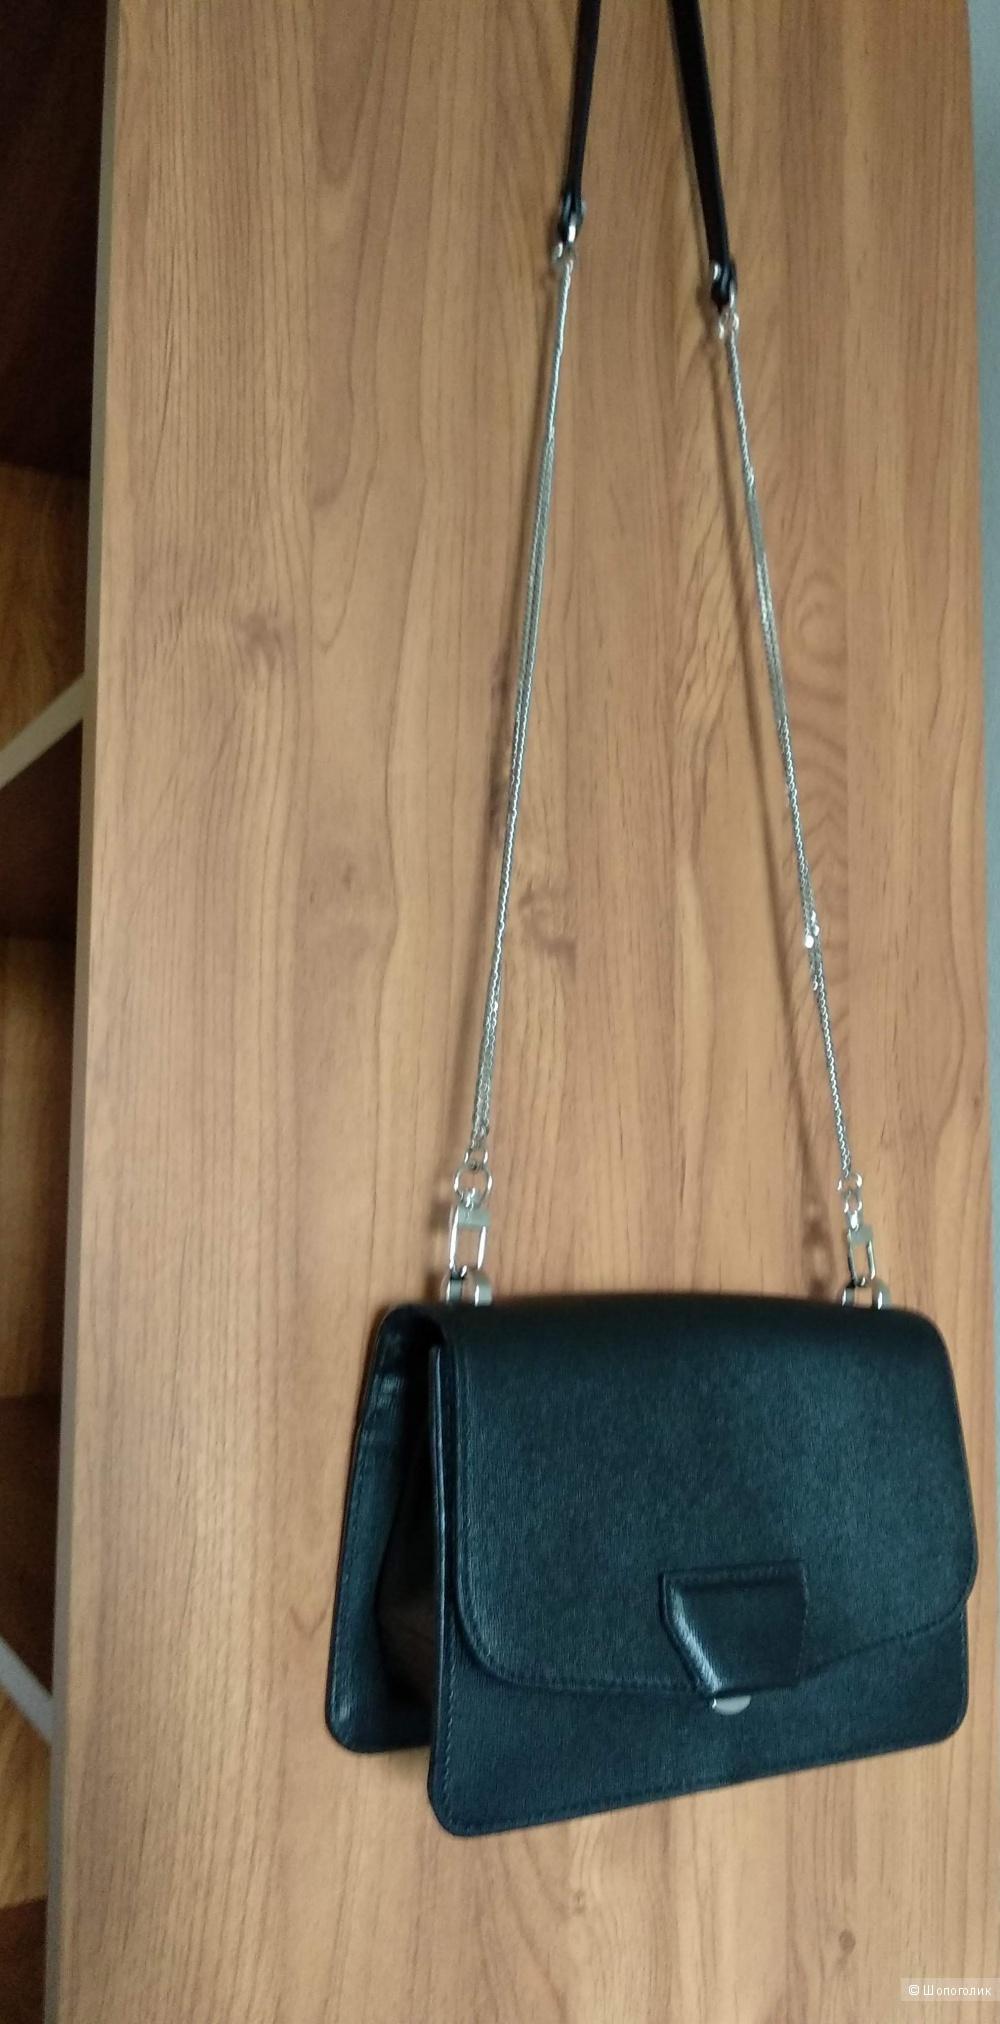 Кожаная сумка Gianni Chiarini, one size